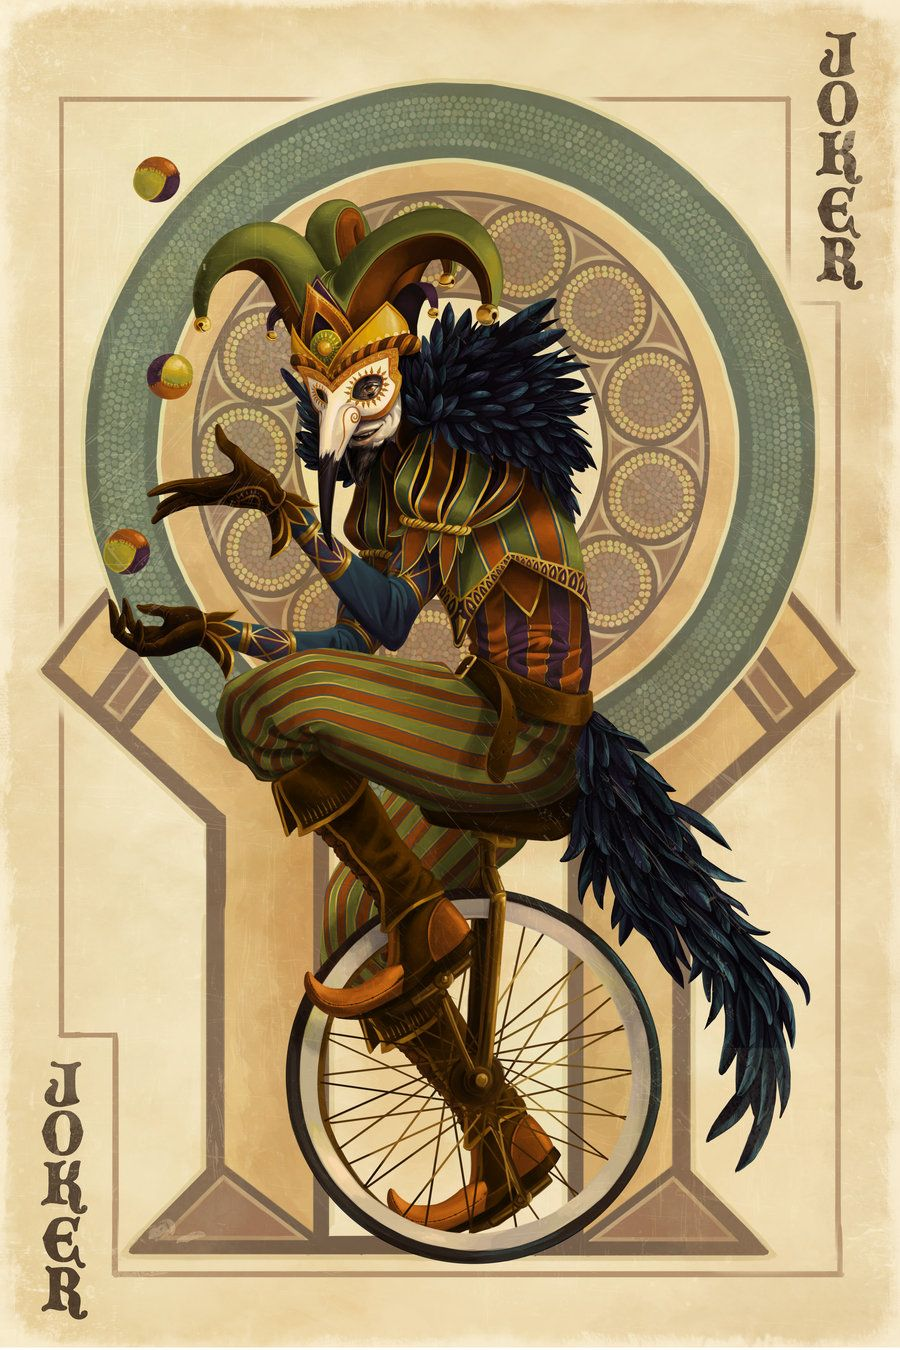 Joker Card by Chronoperates.deviantart.com #piel #shoppiel #inspiration